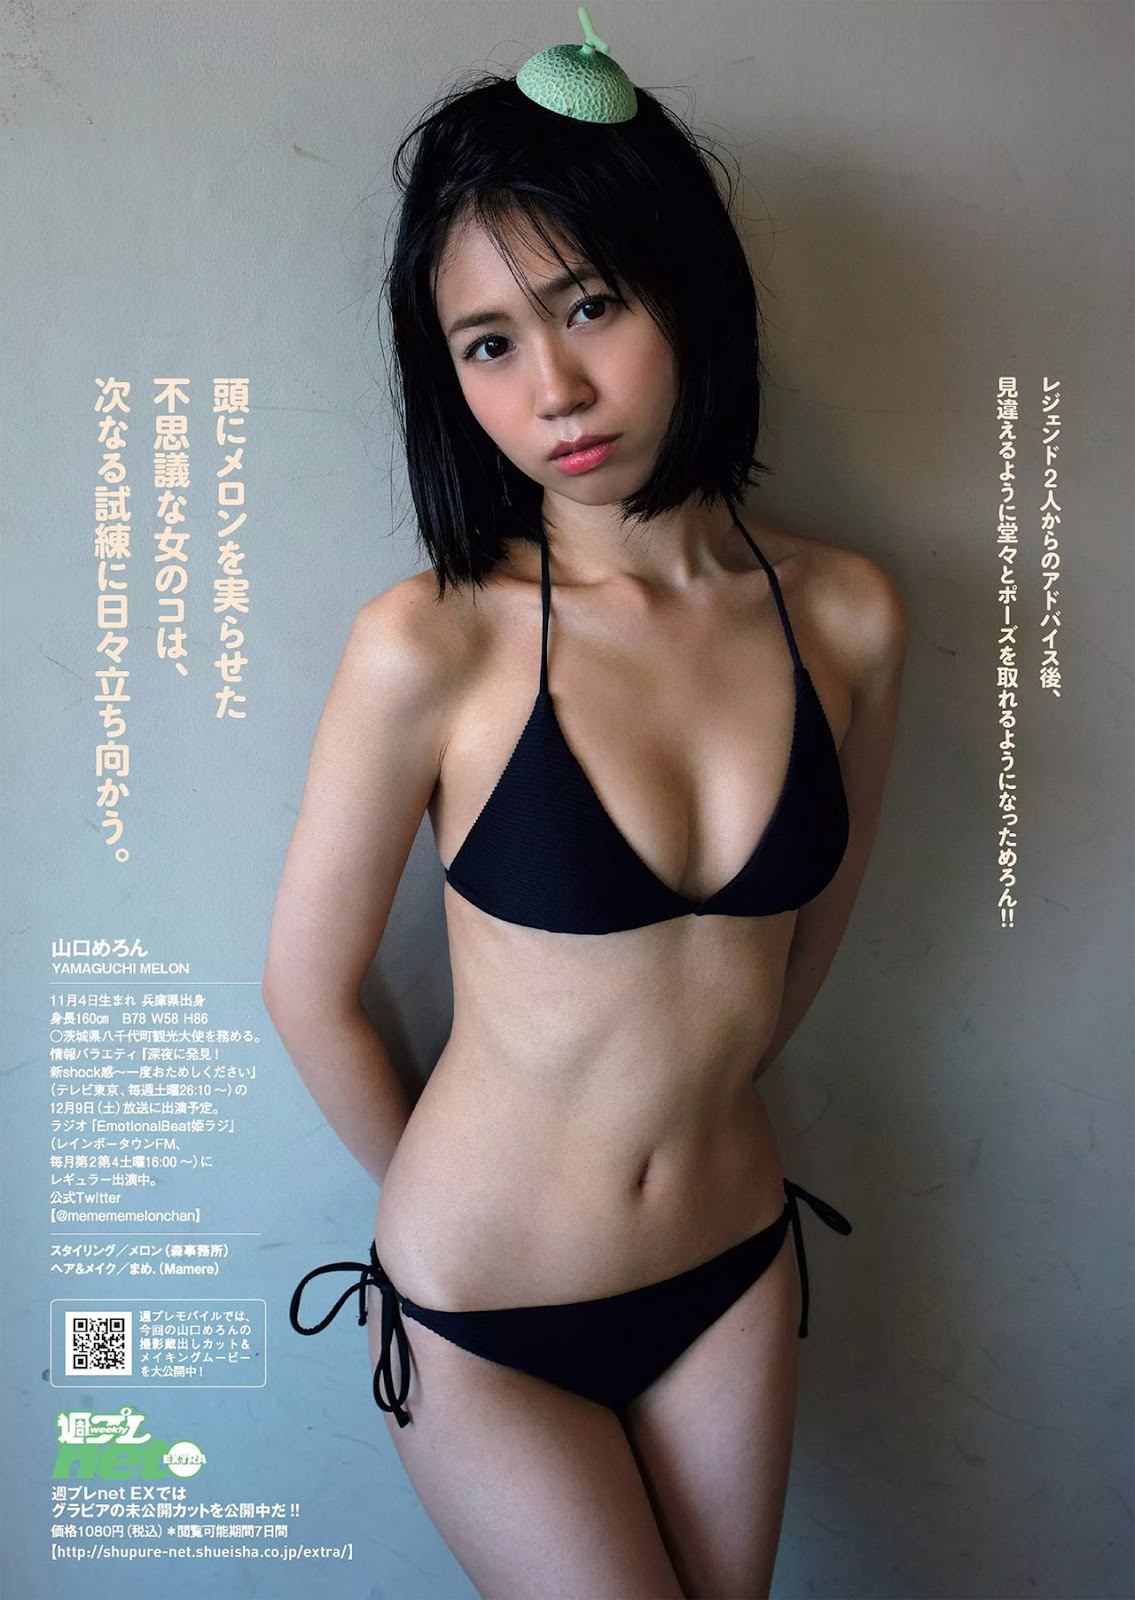 Yamaguchi Melon 山口めろん, Weekly Playboy 2017 No.51 (週刊プレイボーイ 2017年51号)